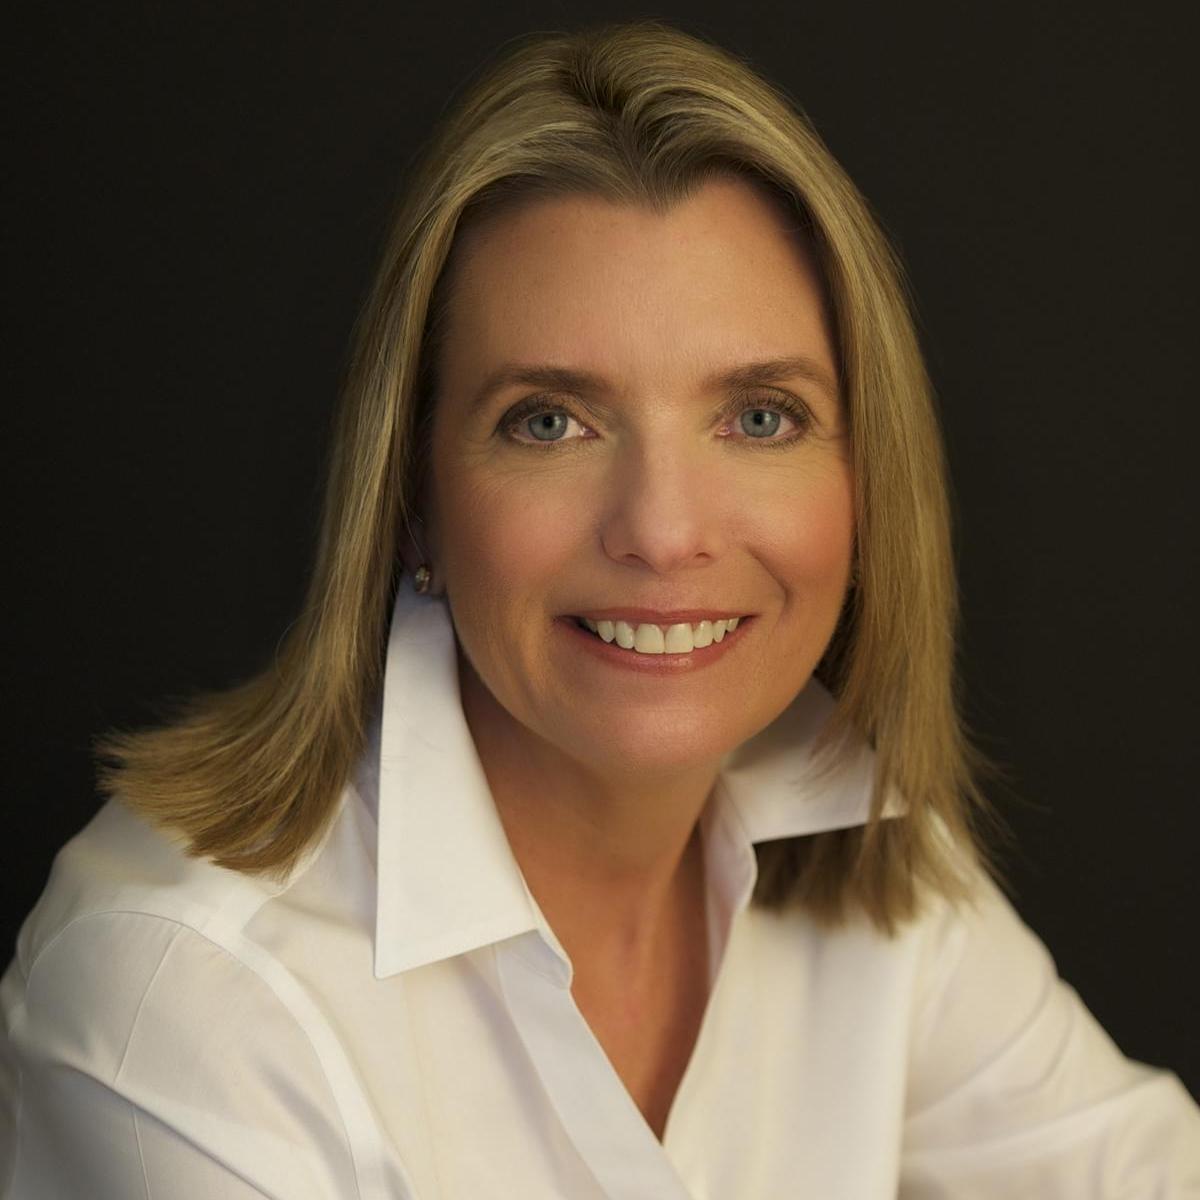 Patty Cook, Dunleavy & Associates